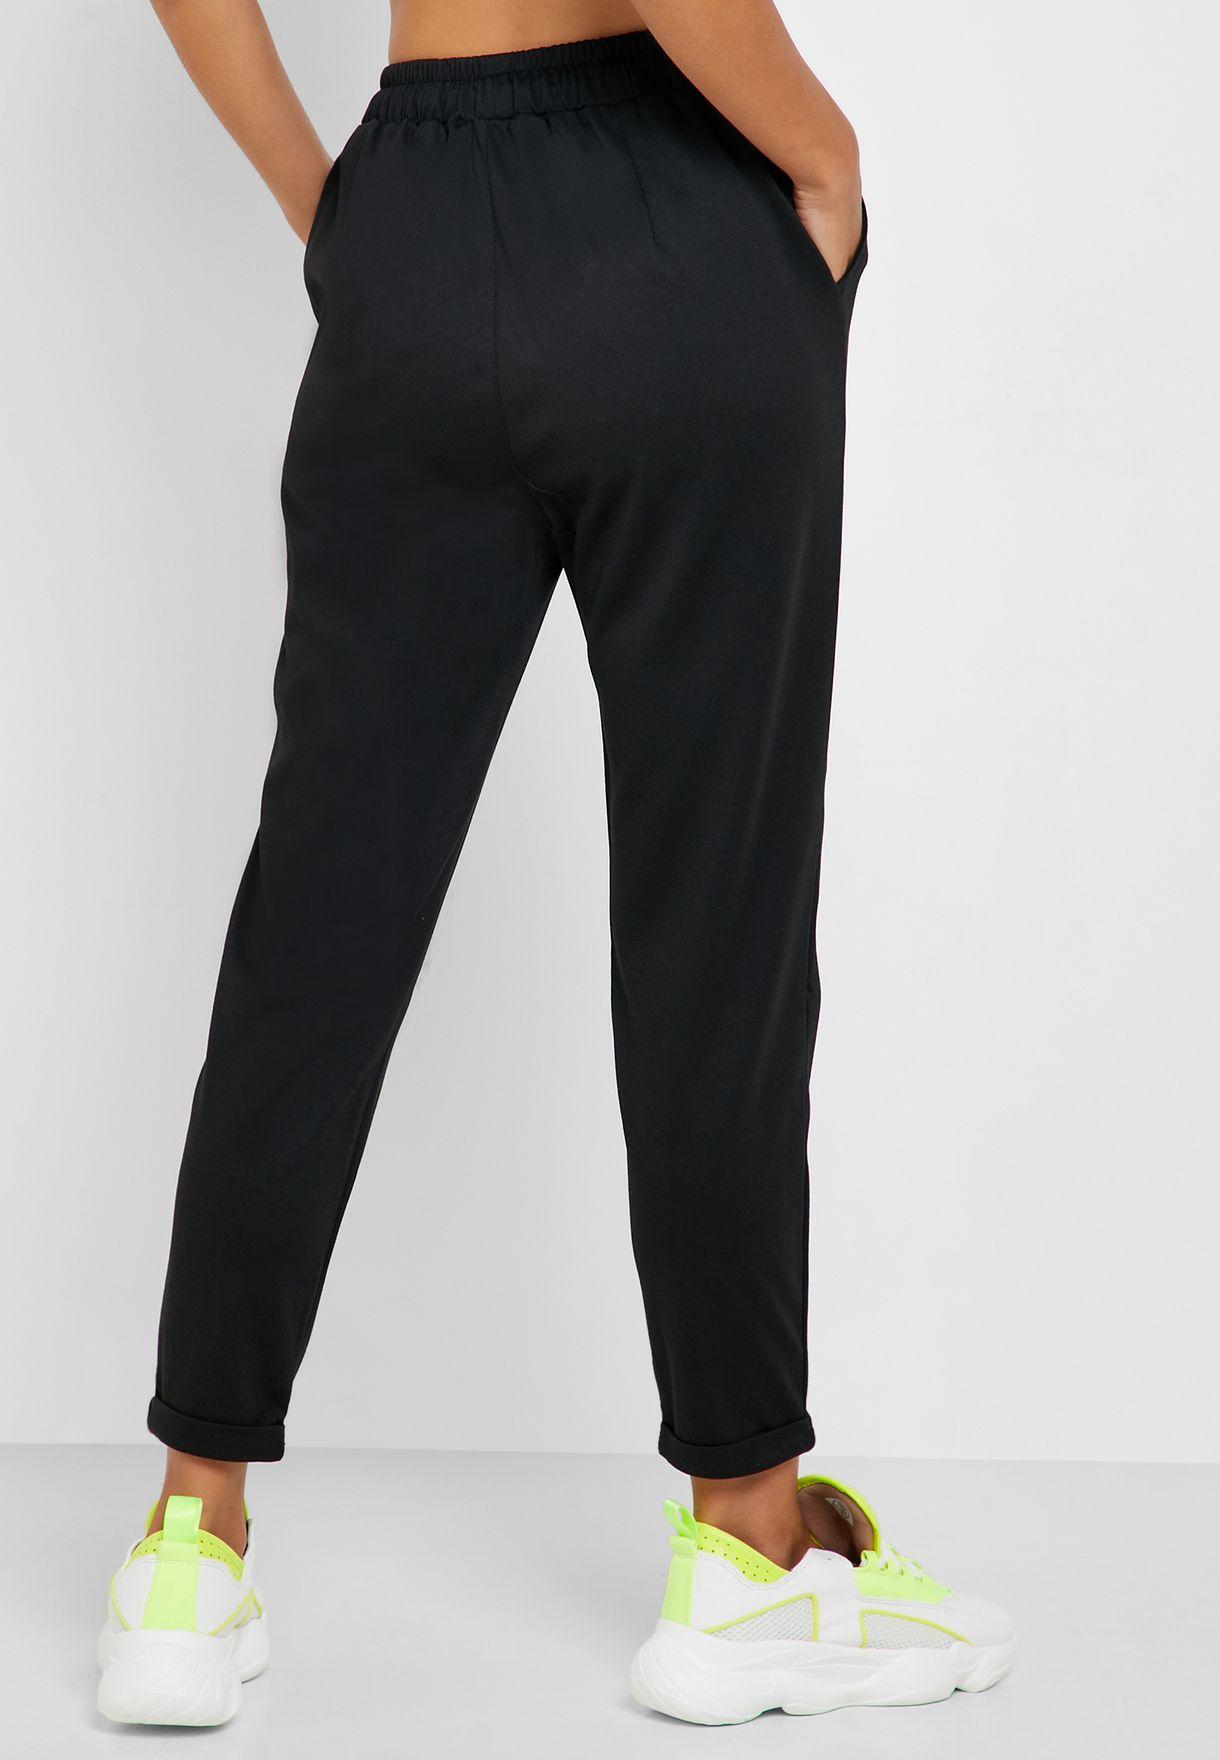 Pintuck Sweatpants